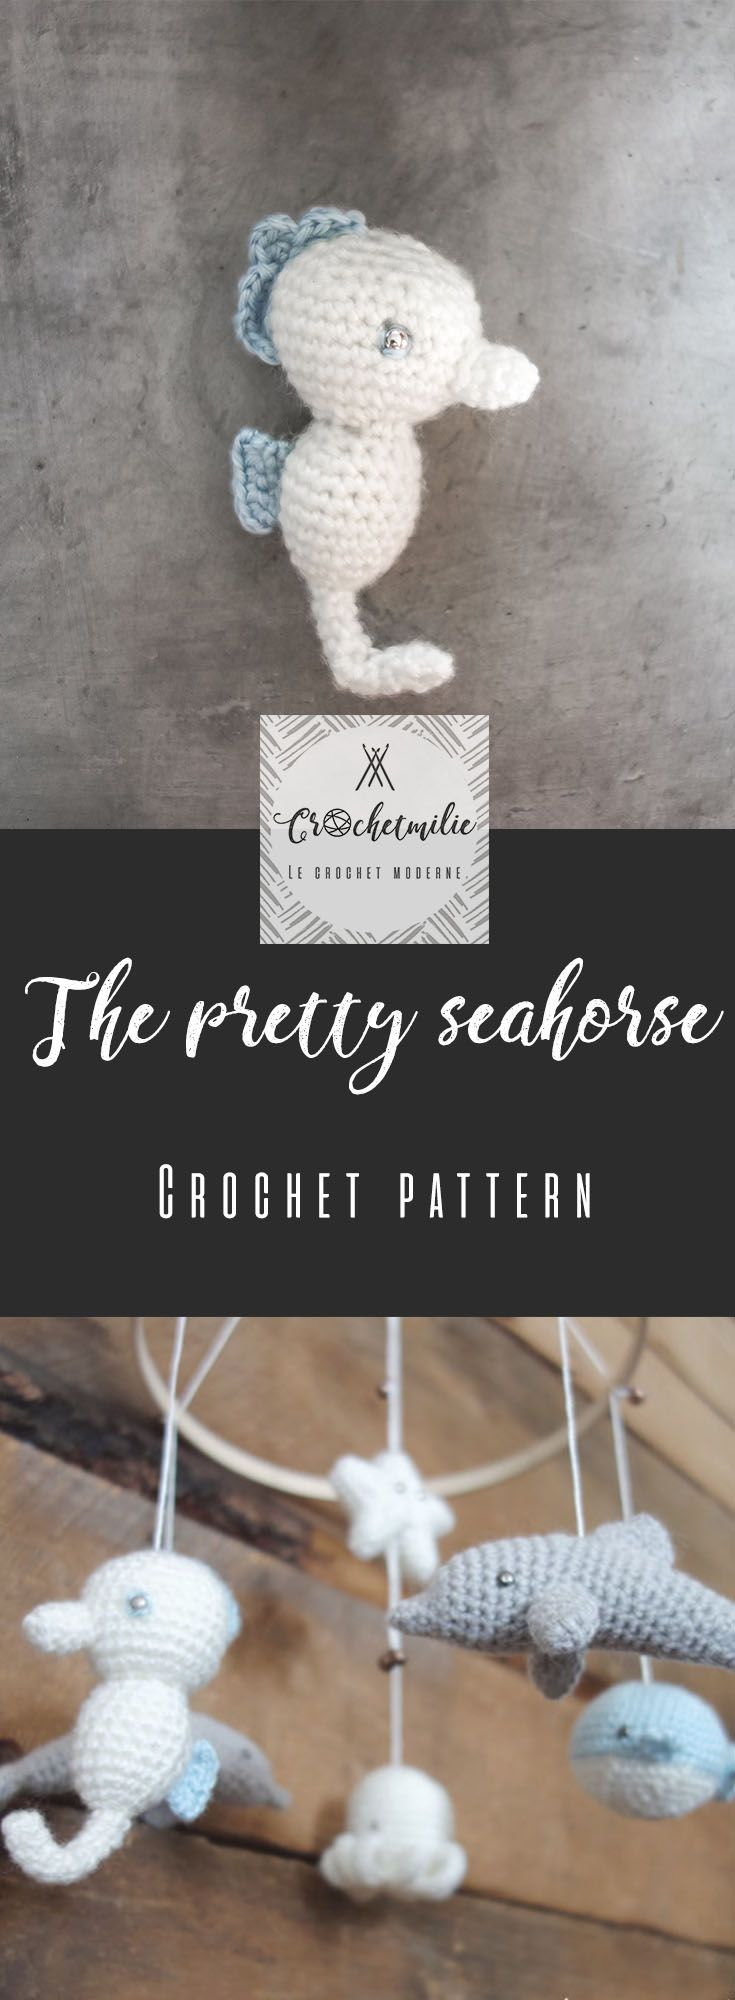 CROCHET PATTERN : the pretty seahorse by CROCHETMILIE ...